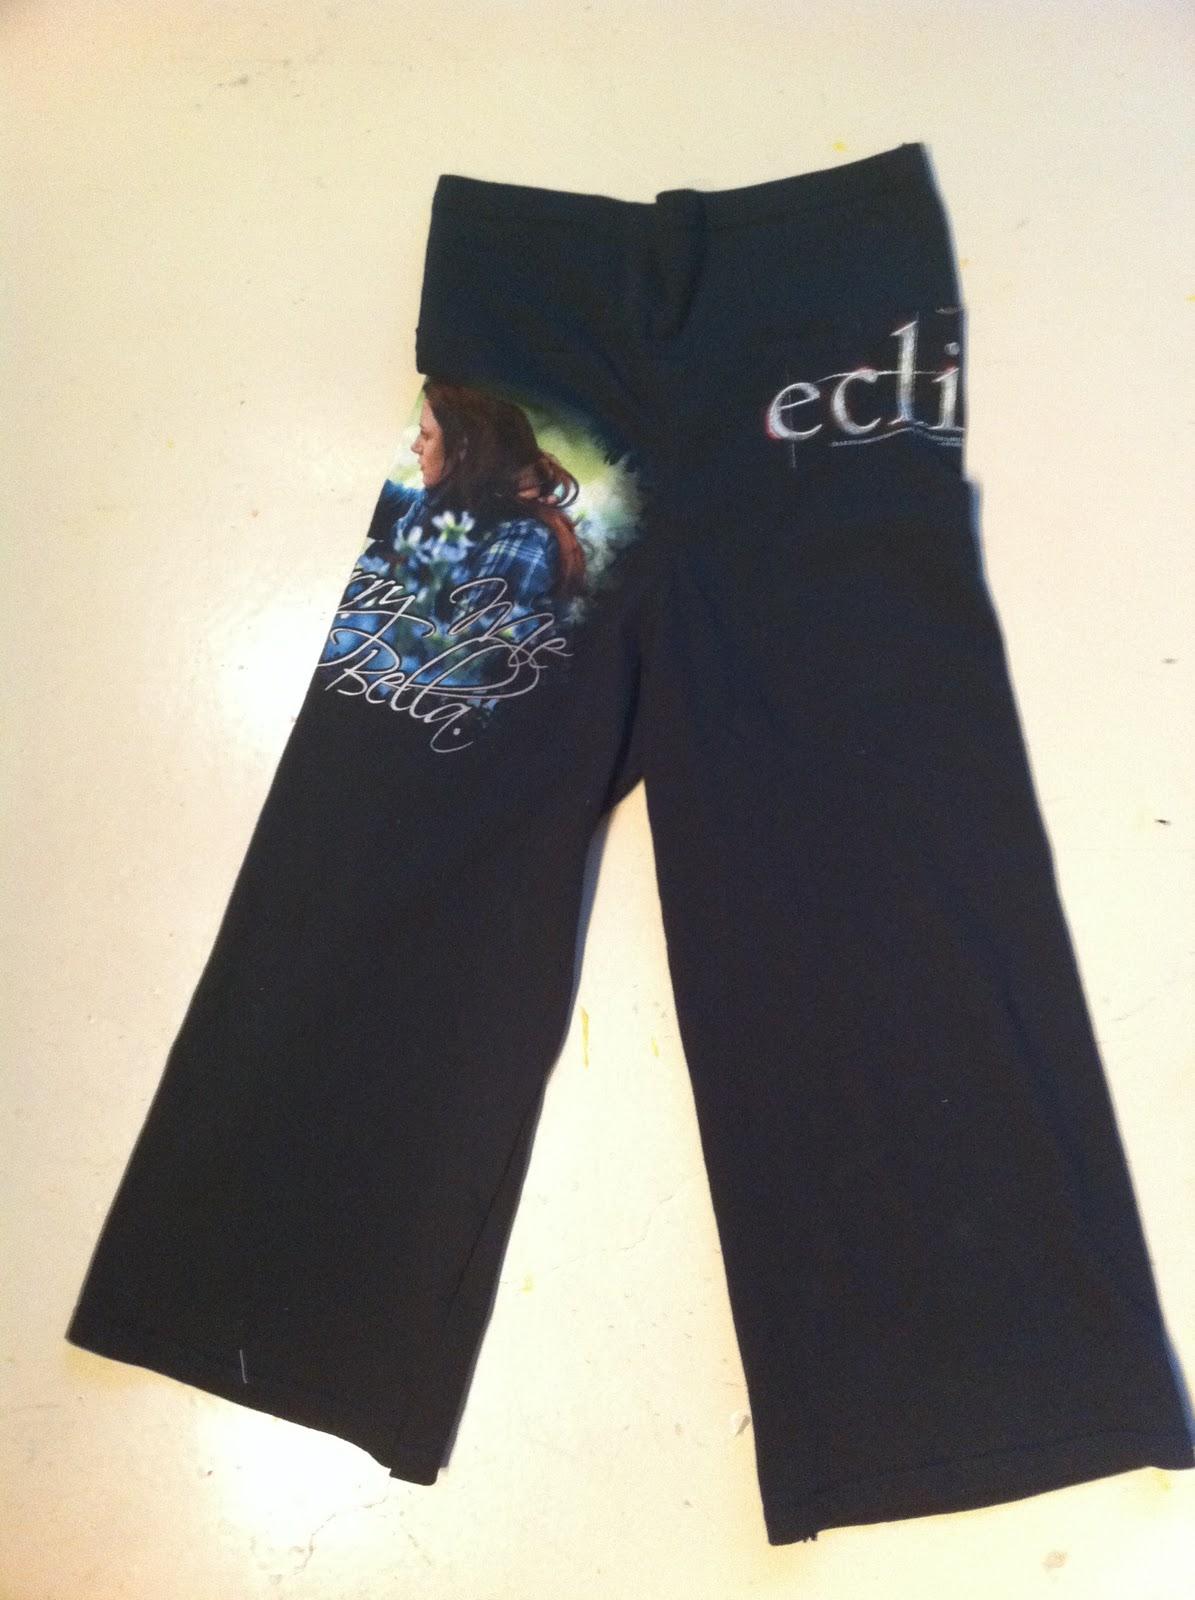 Ripped Yoga Pants Yoga pants from a t-shirt Ripped Yoga Pants Gif